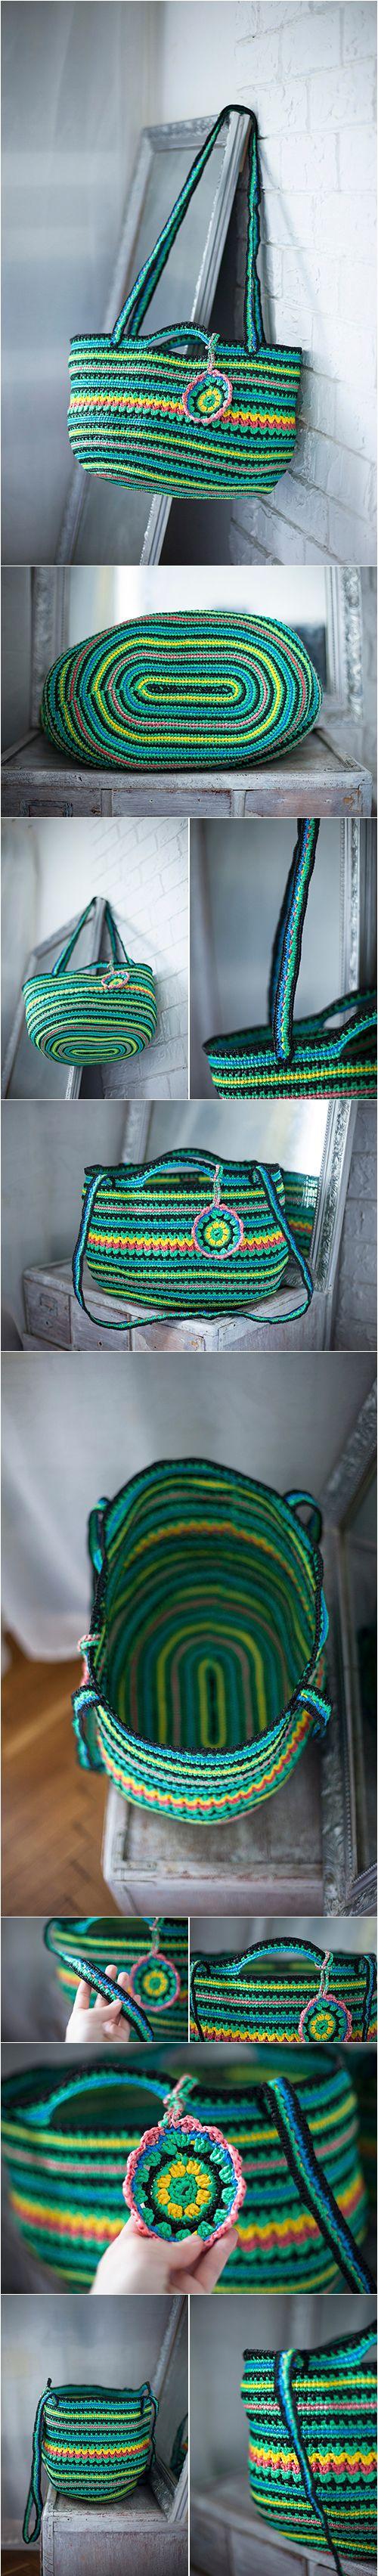 Boho Bag, Rainbow Large Tote, Plarn Bag, Ecofriendly Upcycled Handbag, Shopping Bags, Summer Beach Green Handbag, Multicolored Crochet Purse, Plastic Plarn Bag, #frombabushkashop, shopper, gypsy bag, yoga bag